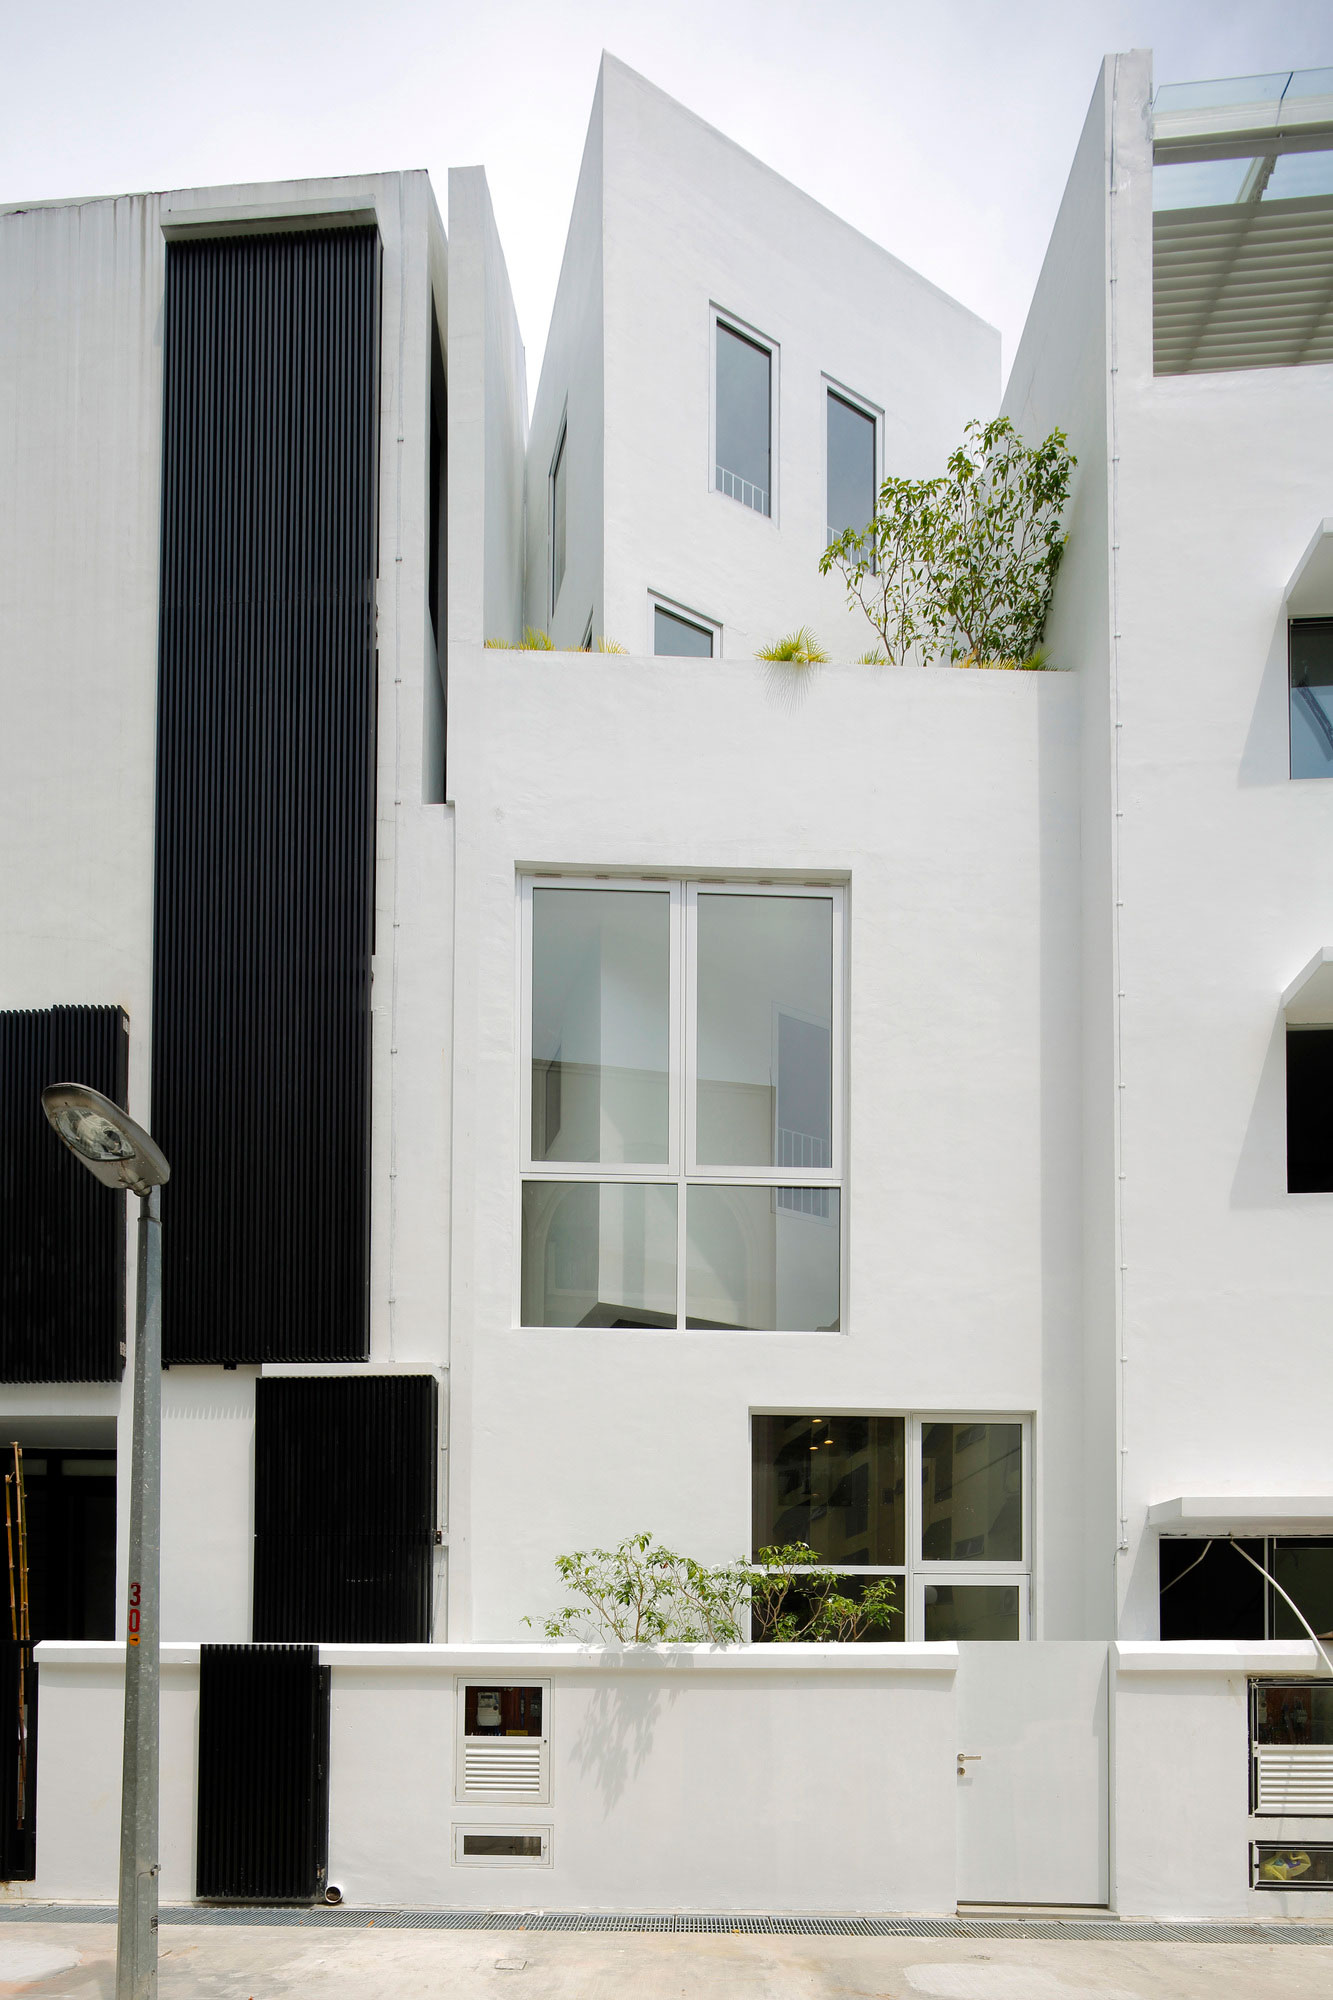 Gallery House by Lekker Design (1)